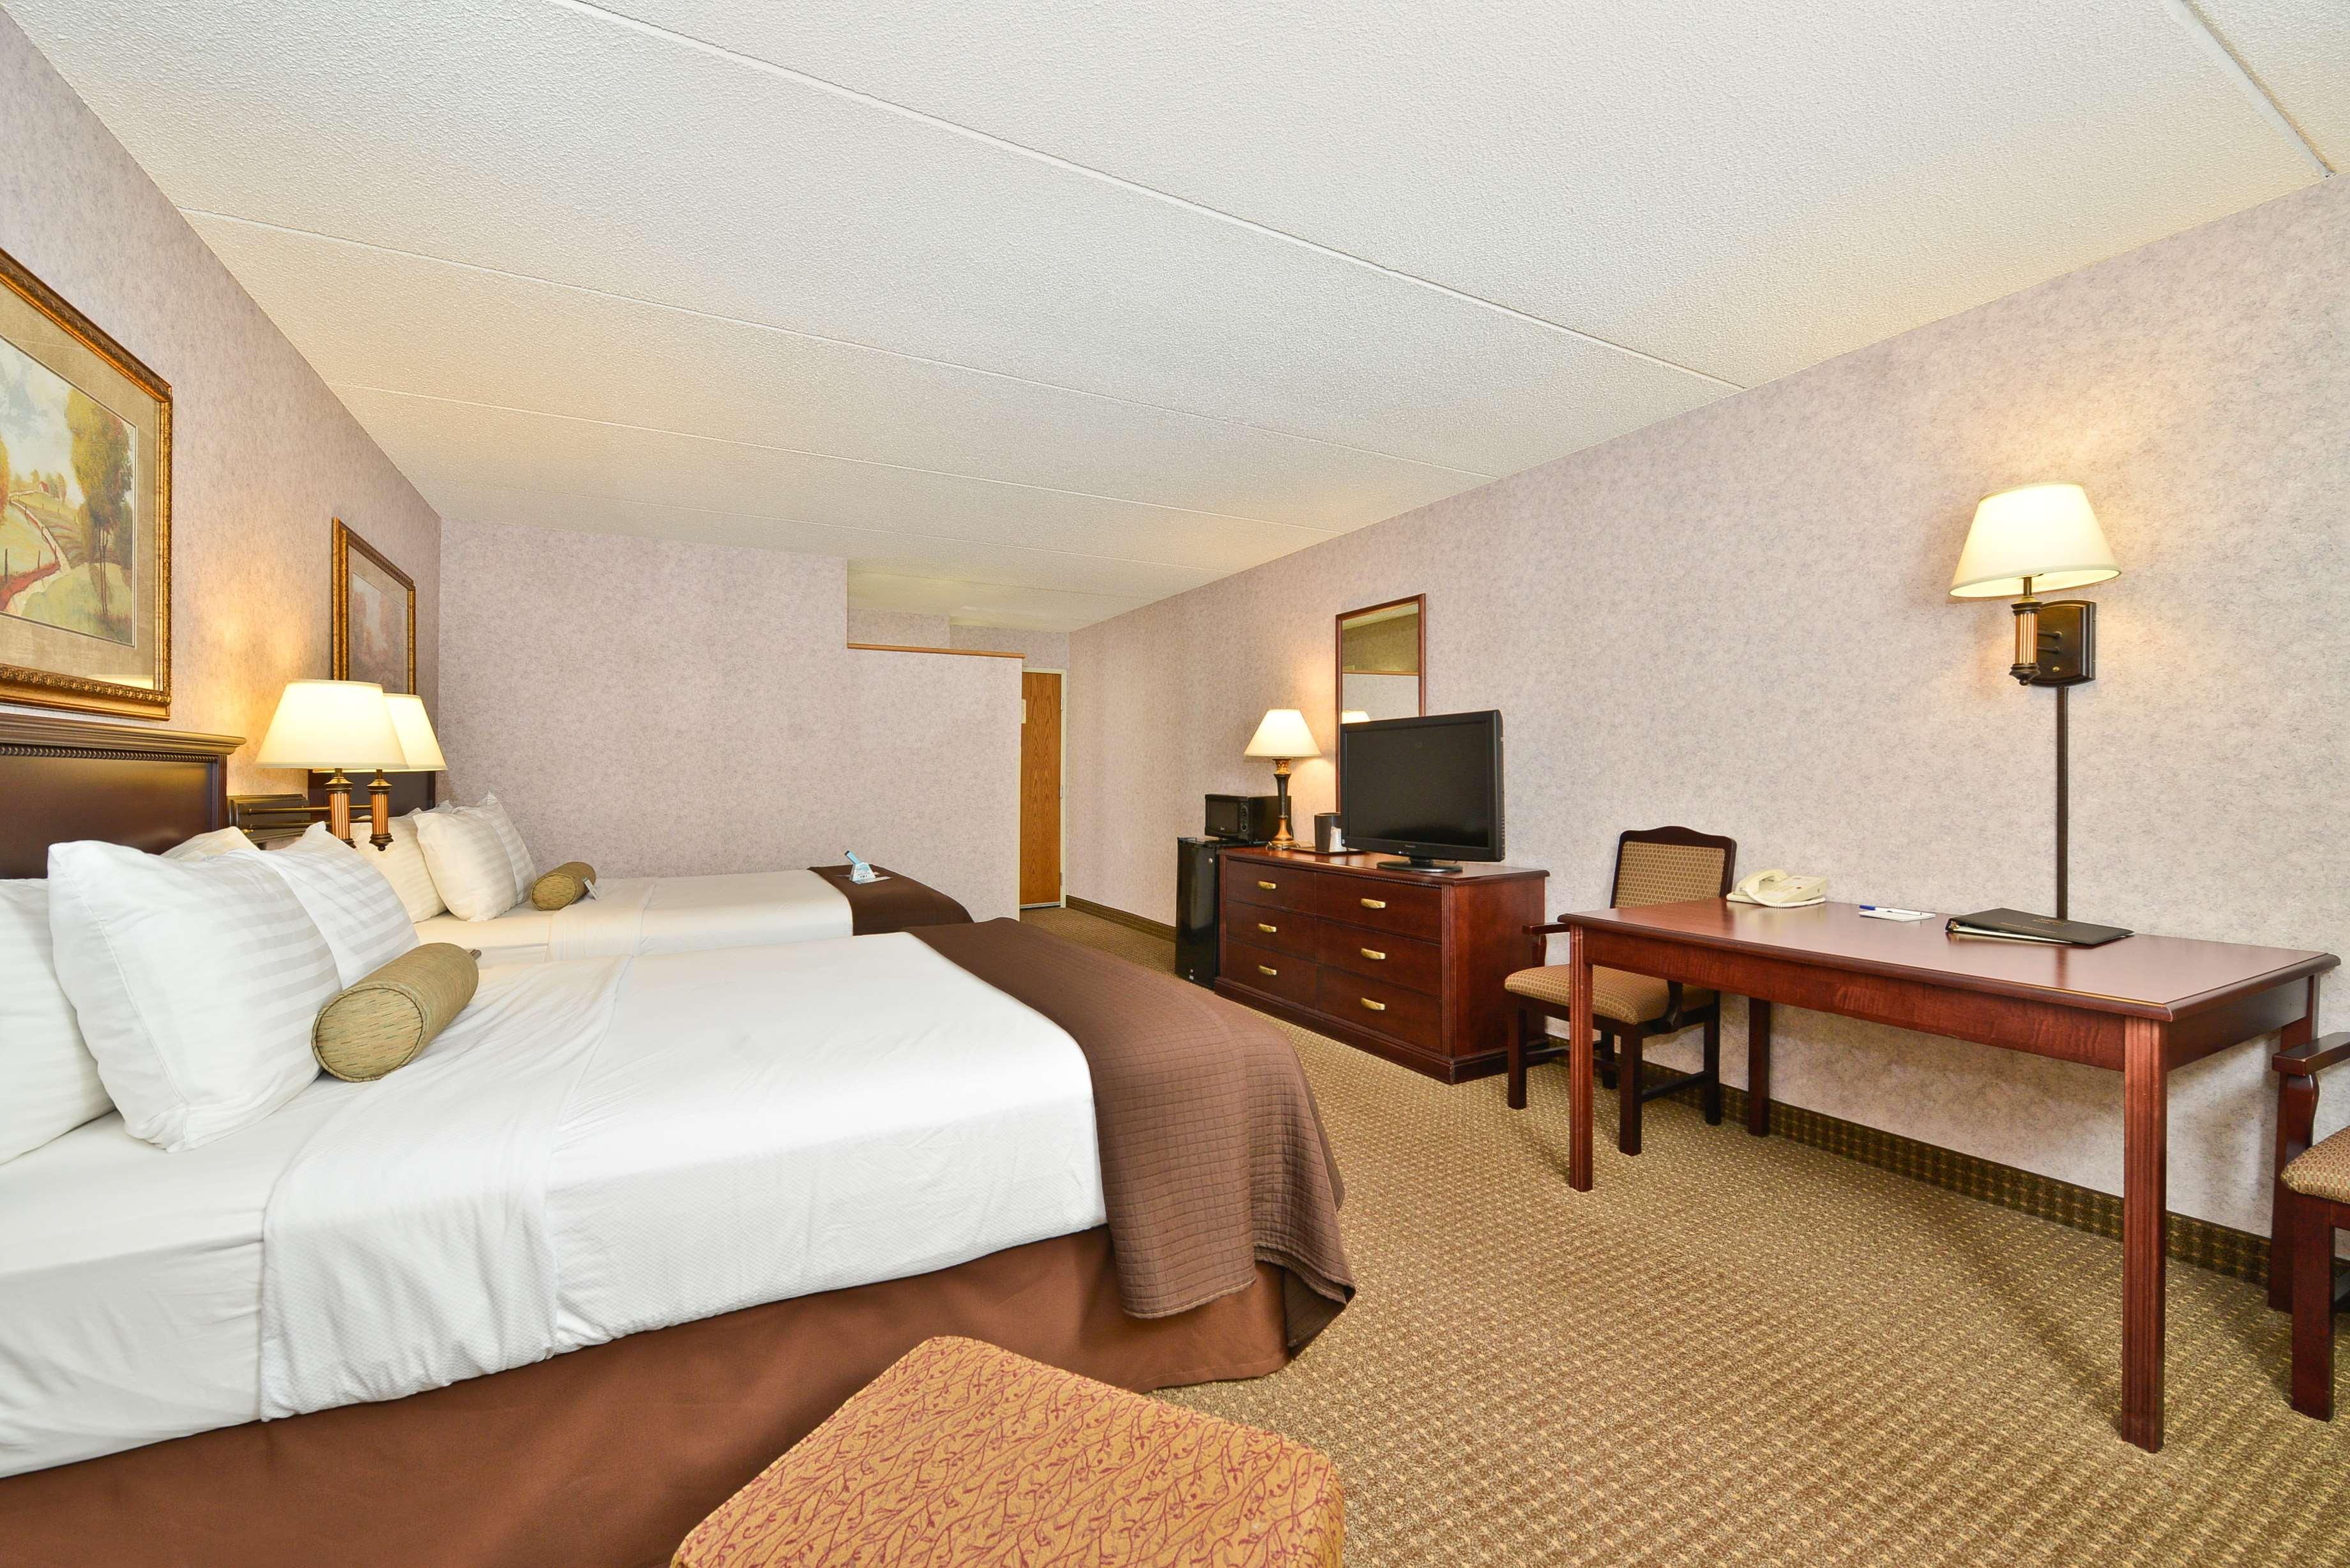 Victorian oaks bed and breakfast st cloud mn : Best western plus kelly inn at th ave s saint cloud